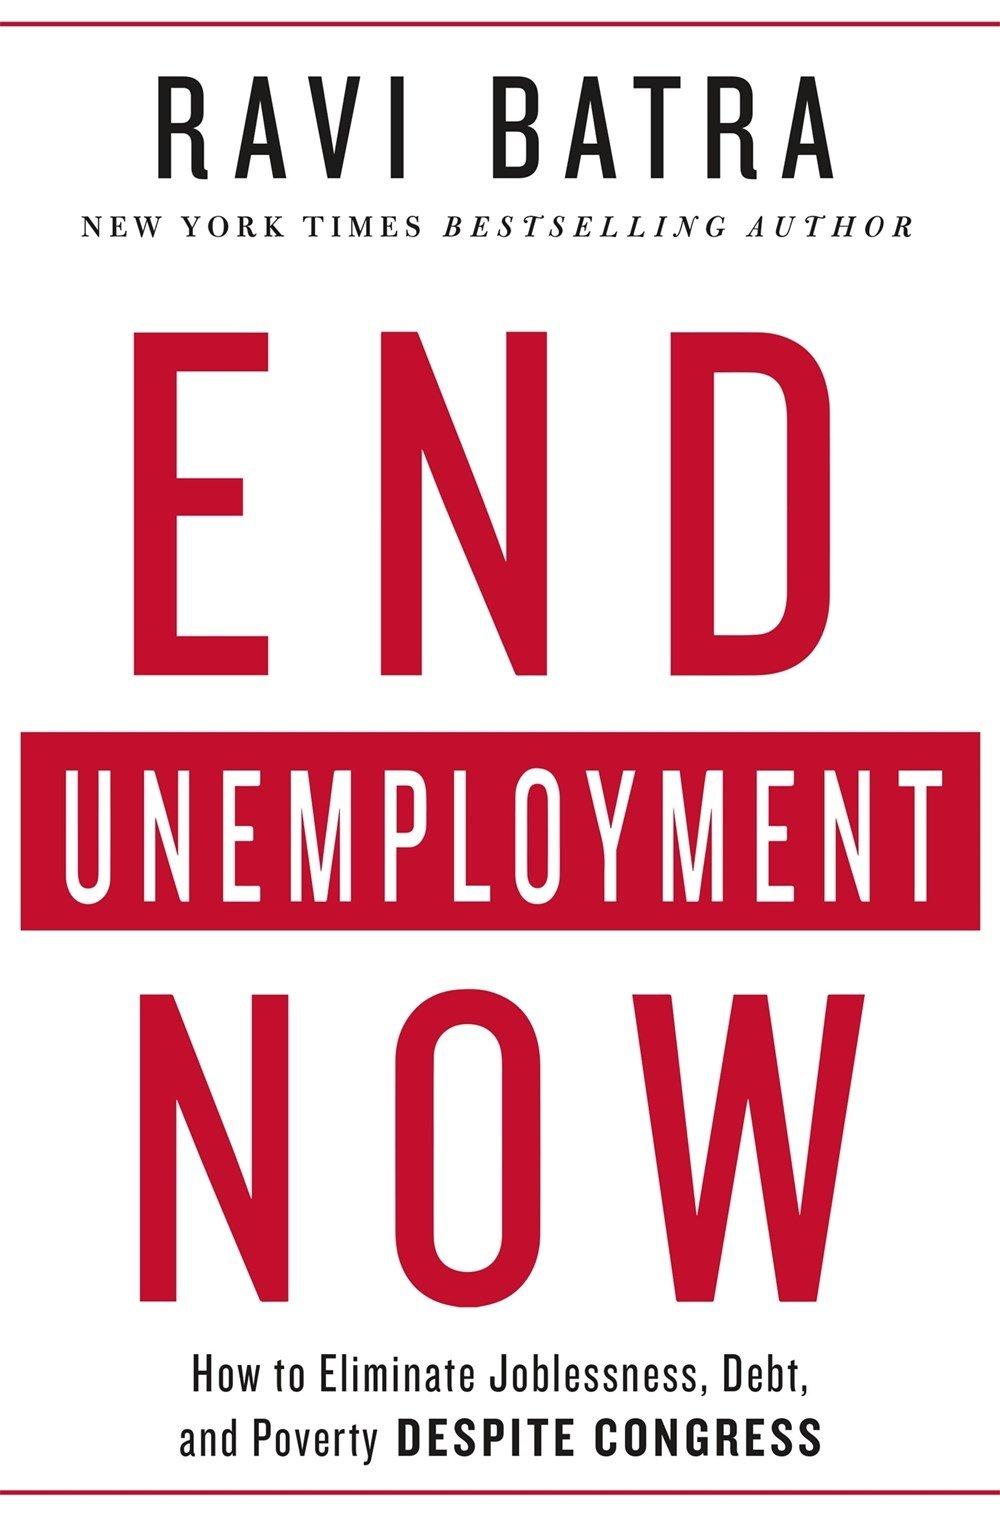 End Unemployment Now: How to Eliminate Joblessness, Debt, and Poverty Despite Congress: Amazon.es: Batra, Ravi: Libros en idiomas extranjeros